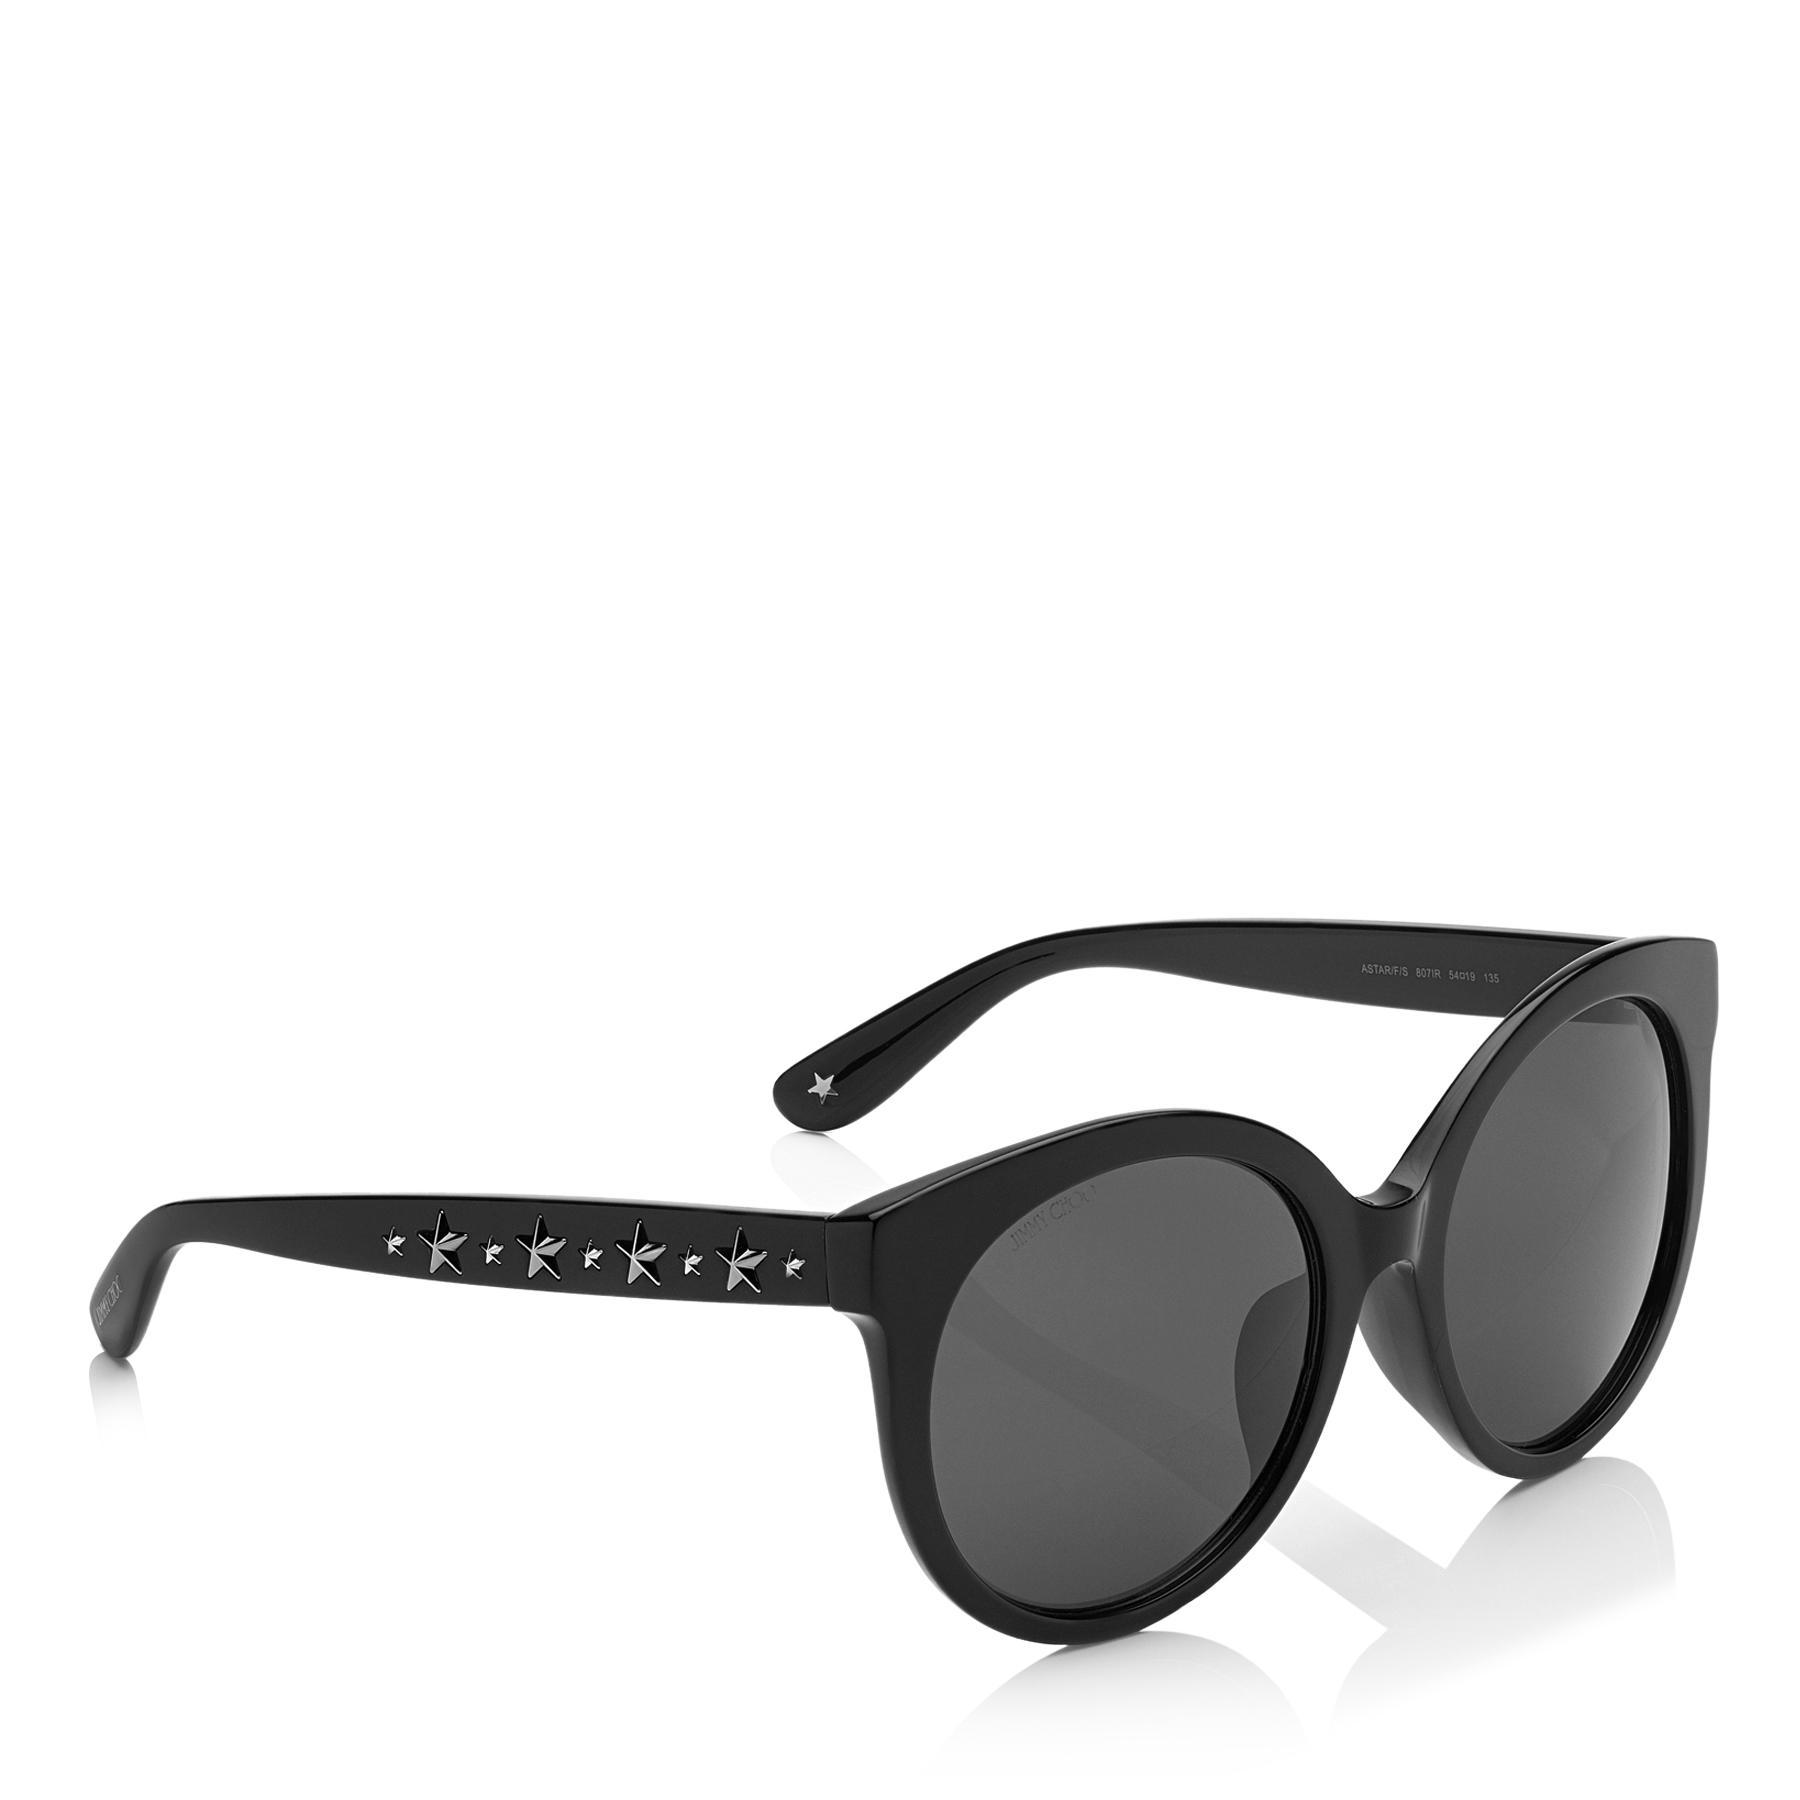 6c5639876e5 Jimmy Choo - Astar Black Oversized Sunglasses With Star Stud Detailing -  Lyst. View fullscreen